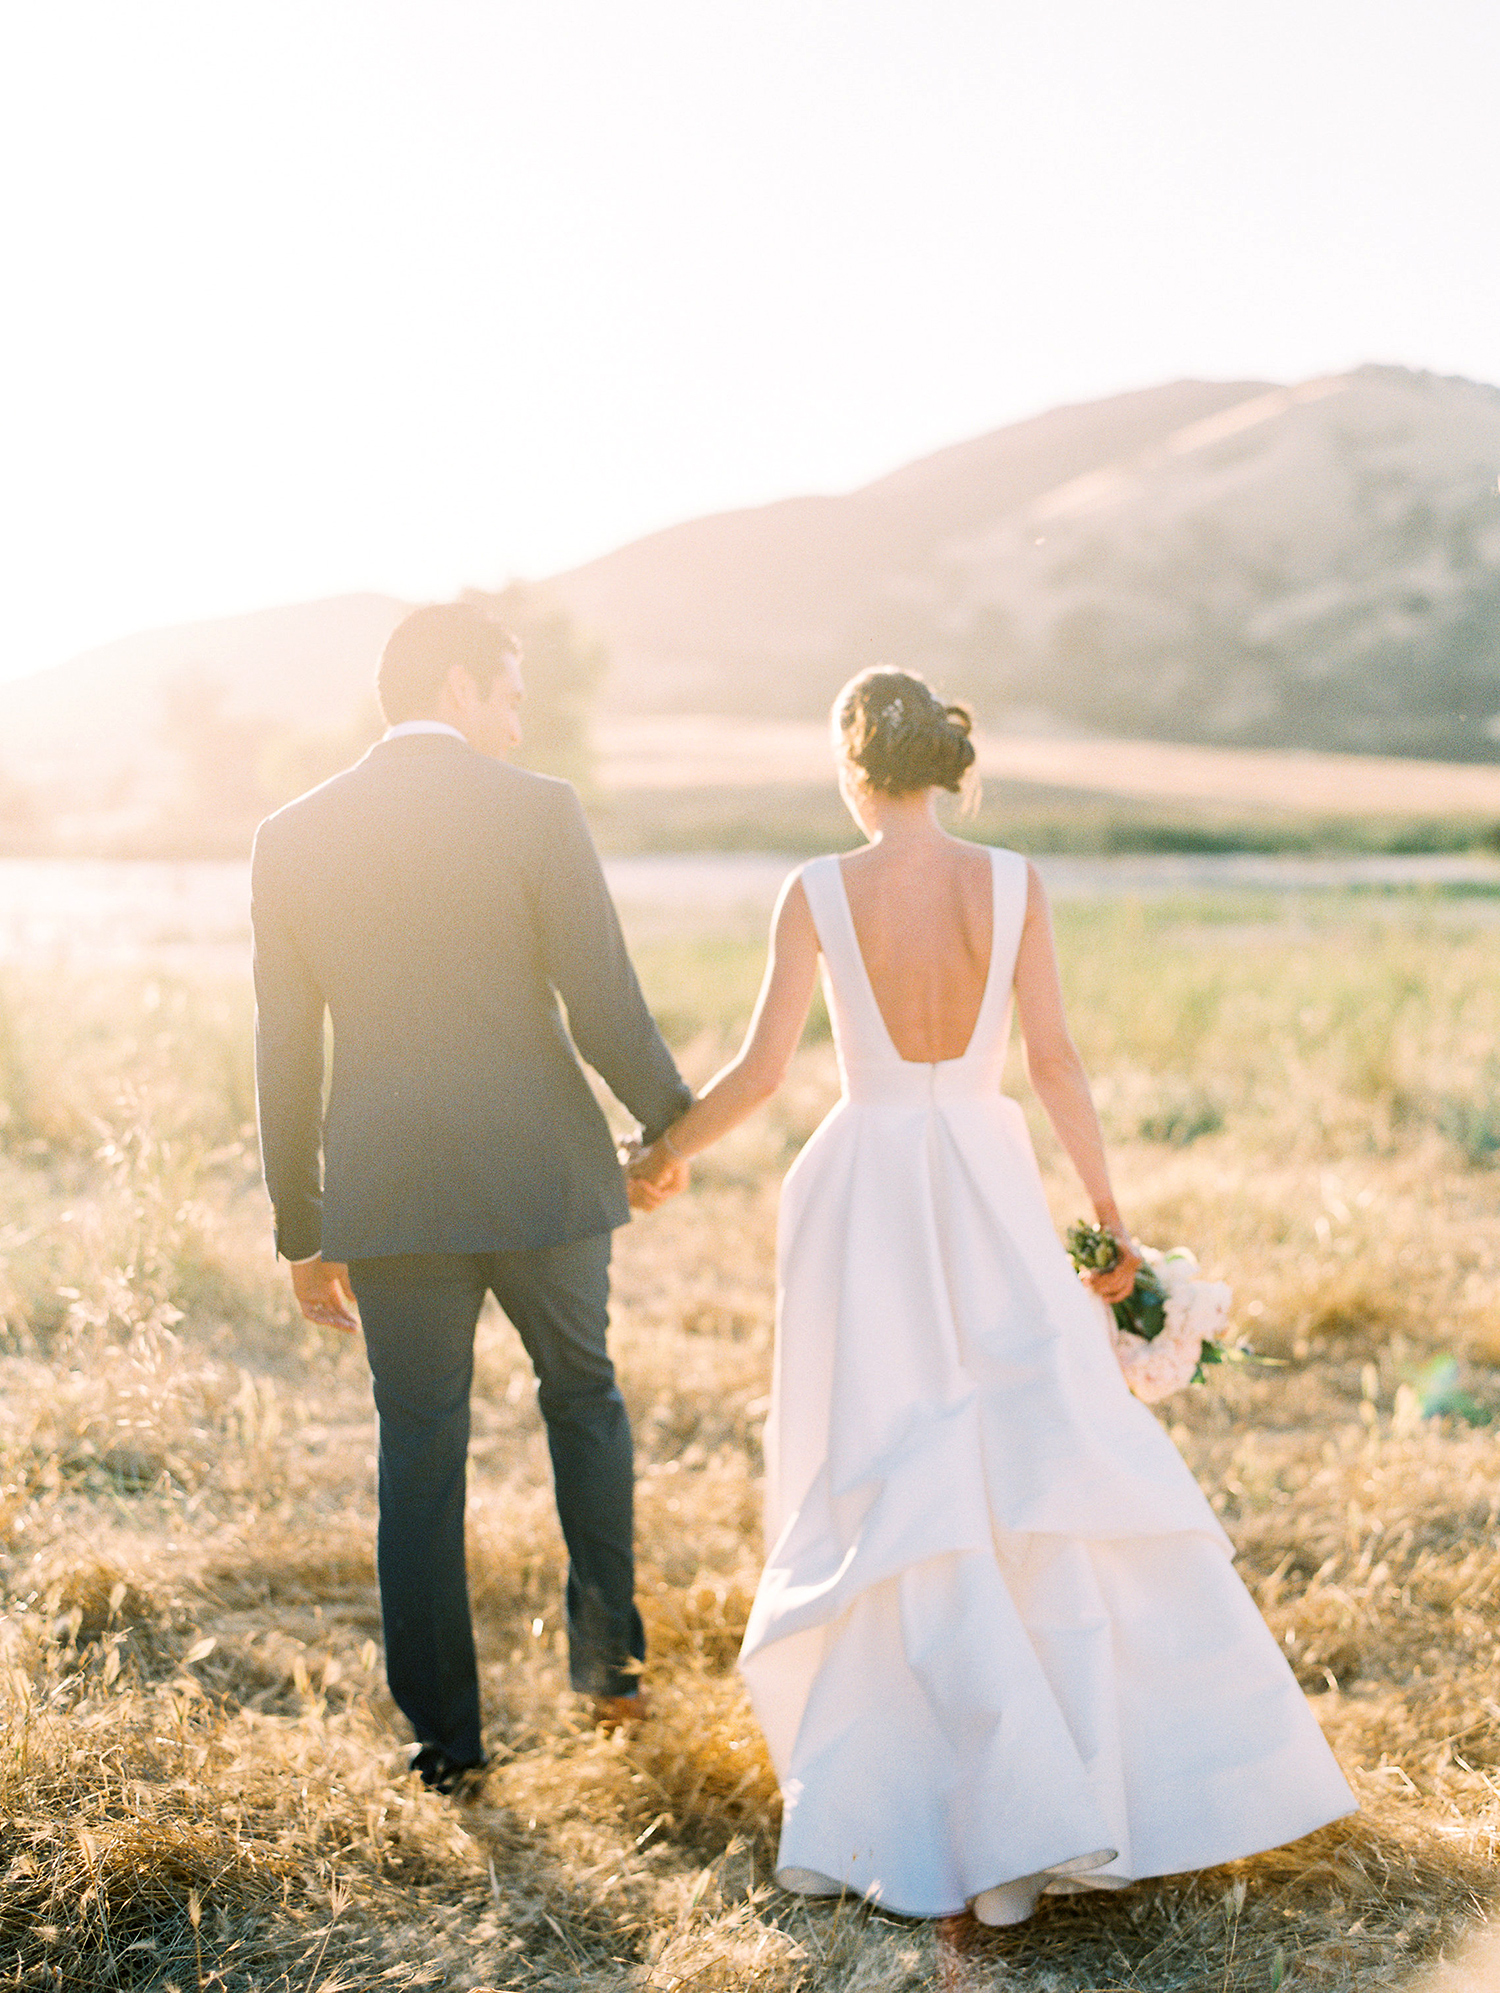 caitlin amit wedding couple walking in field